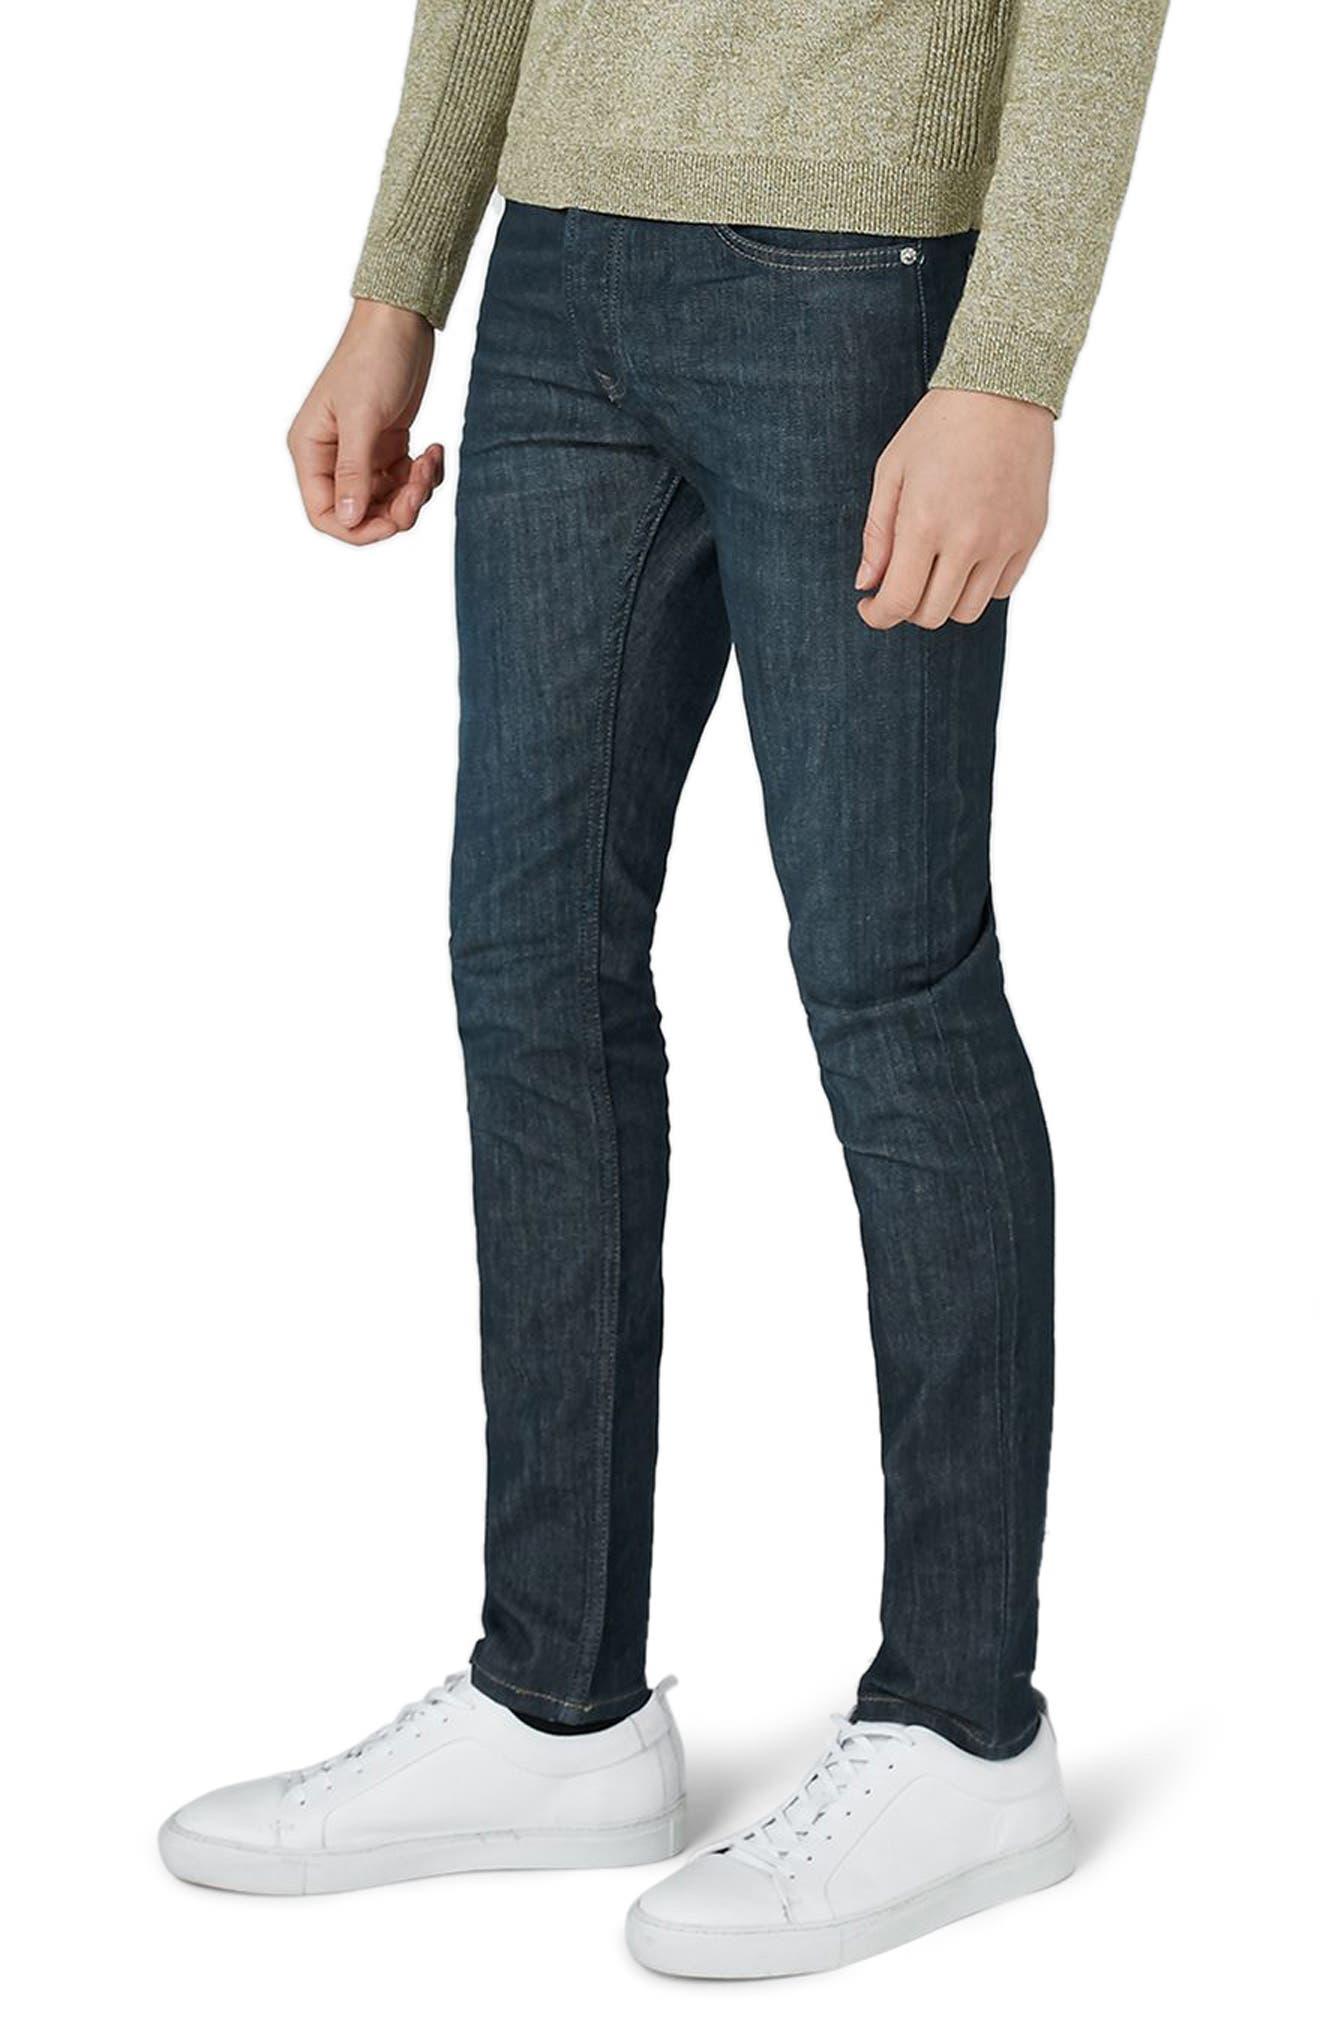 Topman Coated Denim Skinny Jeans